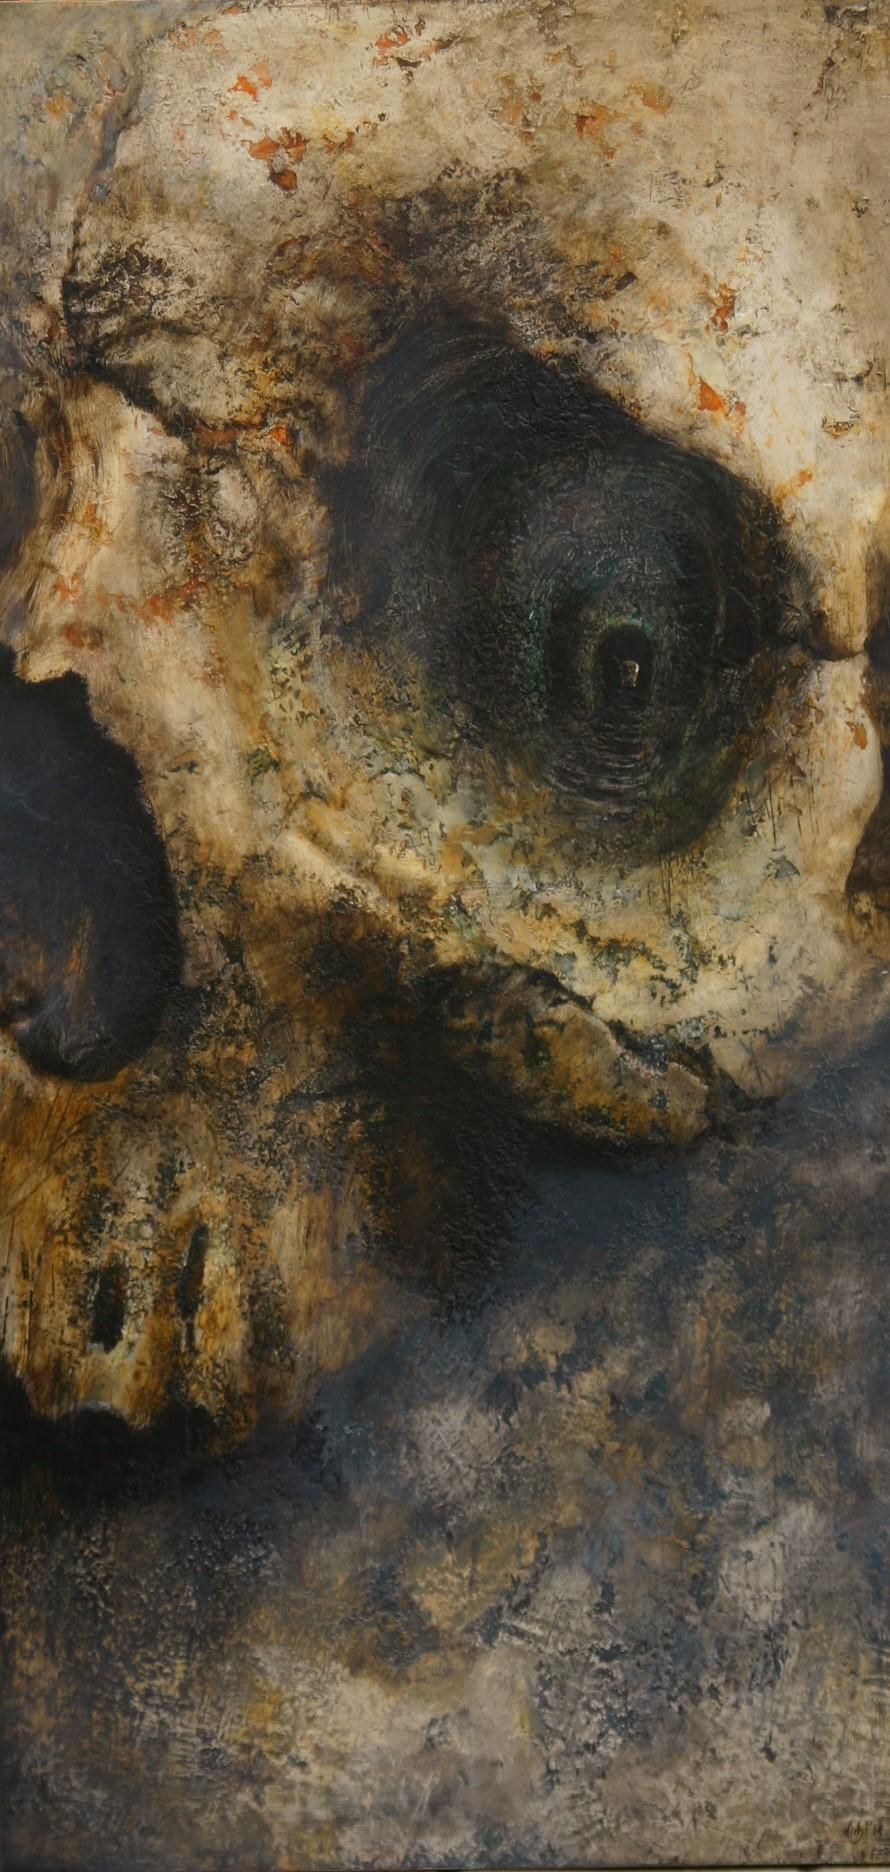 Et in Arcadia ego - Listen to the Death.  2014,  120x60, olio su tavola.